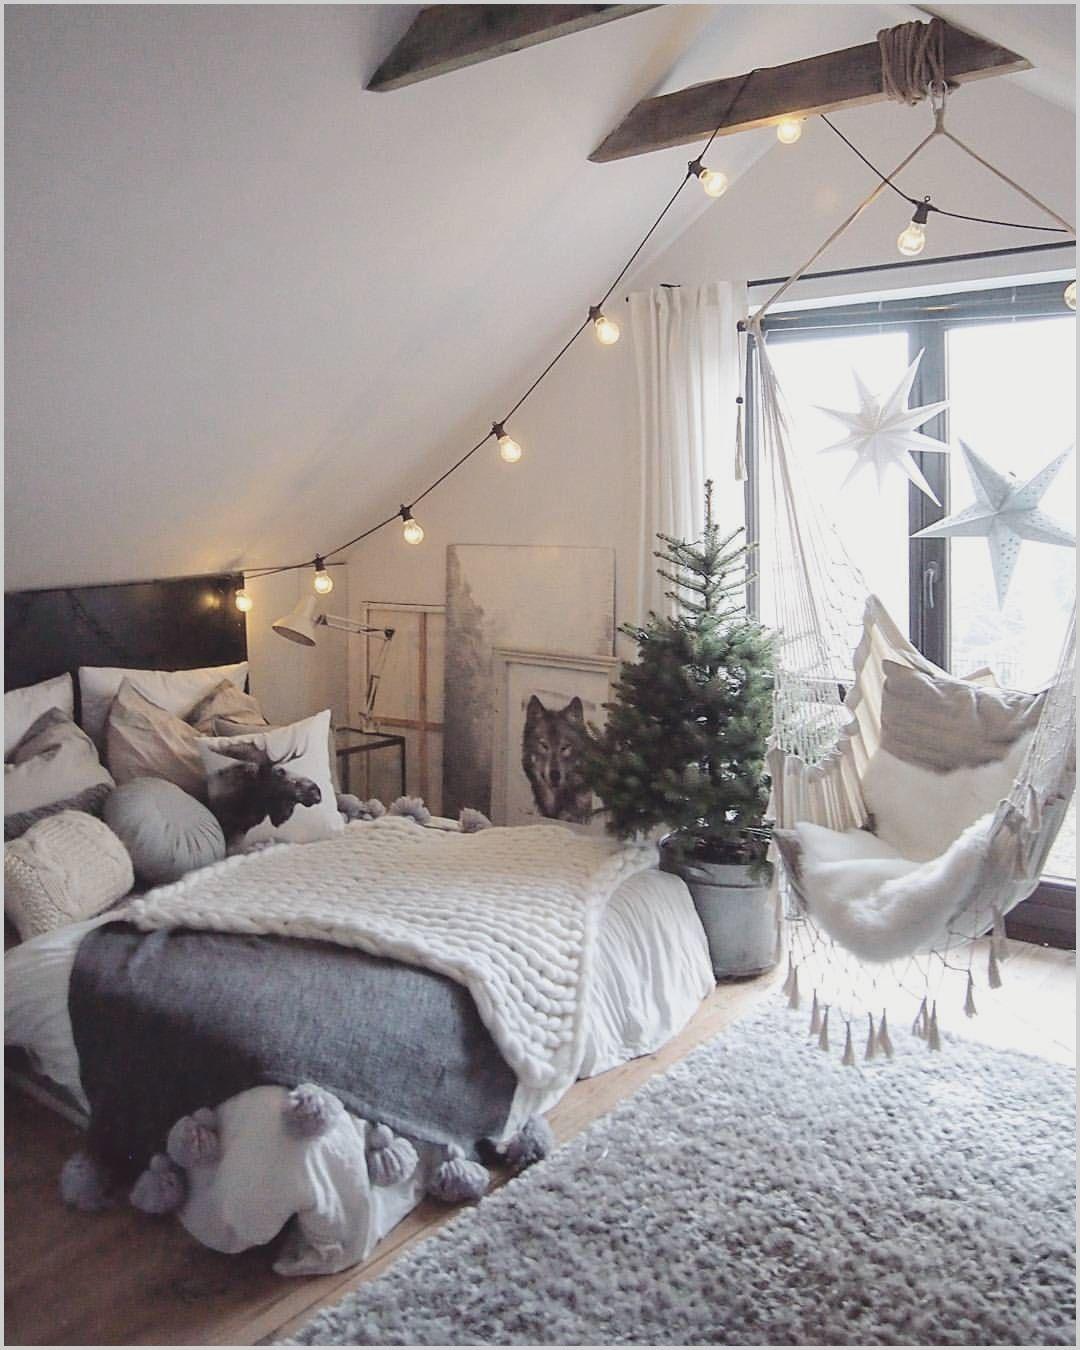 Bedroom Decor Ideas Instagram In 2020 Bedroom Decor Cozy Bedroom Ideas Pinterest Small Room Bedroom